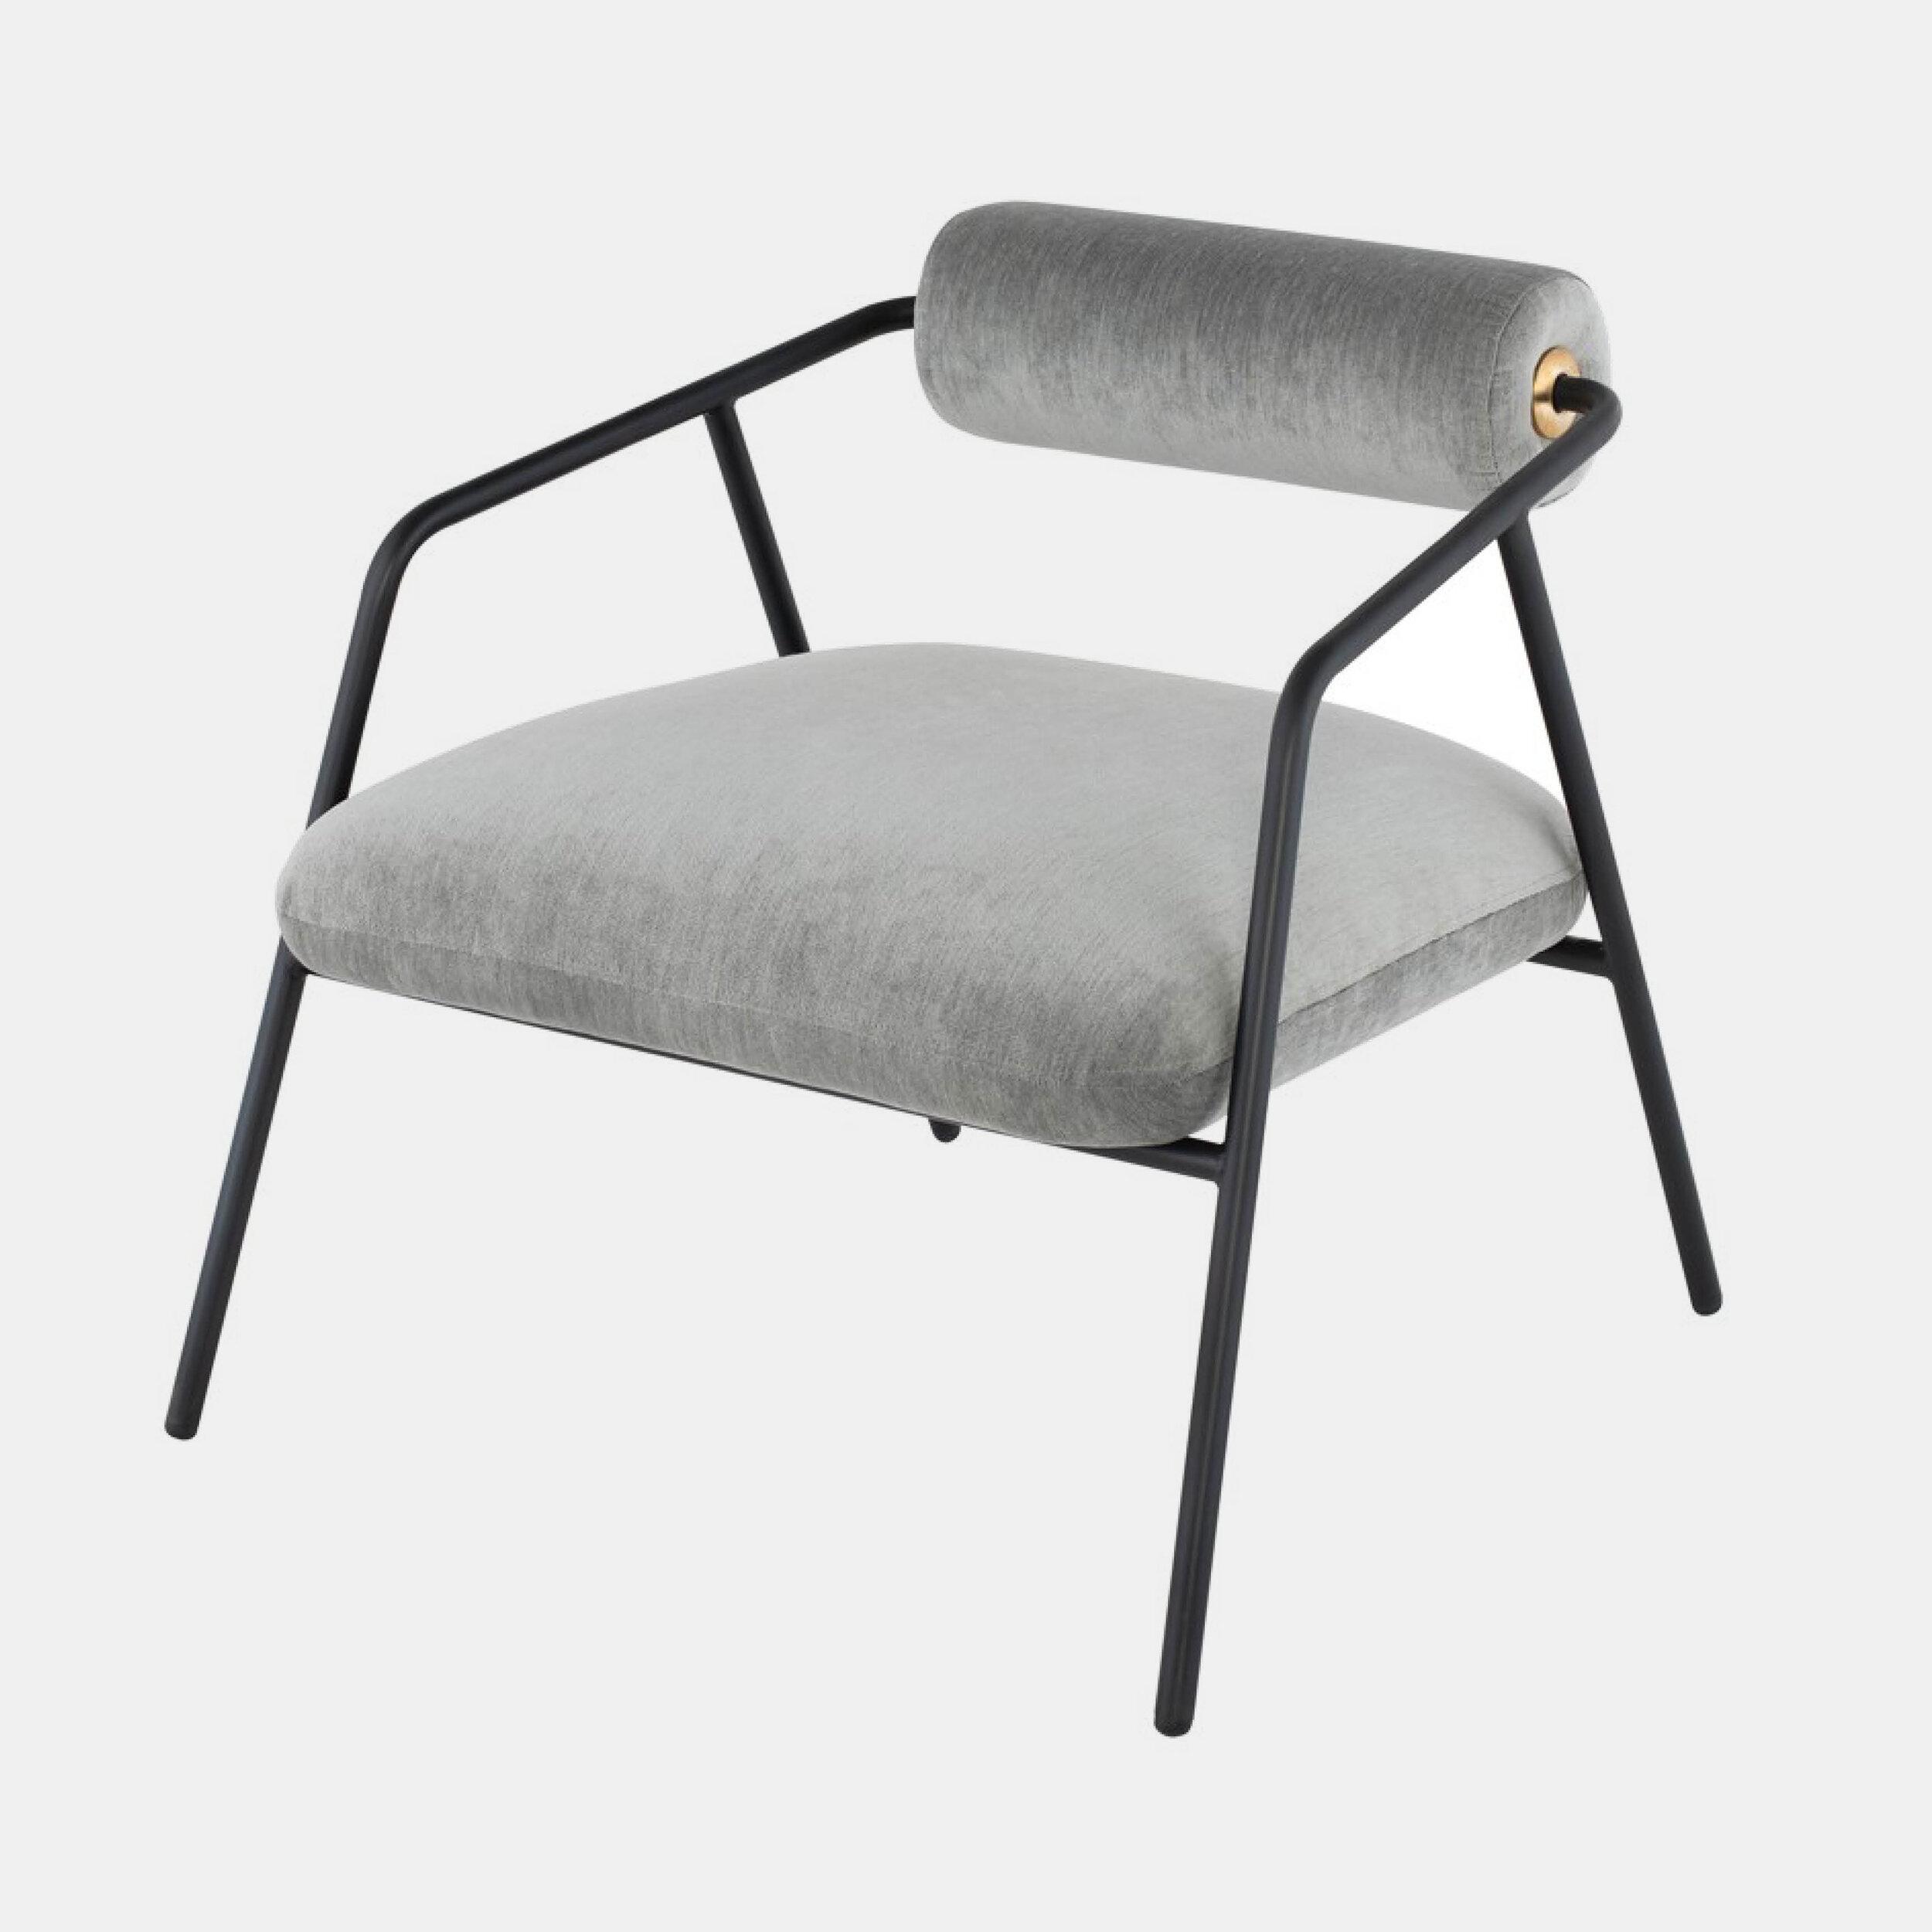 shop-mayker-home-gifting-design-nashville-hawkes-chair.jpg